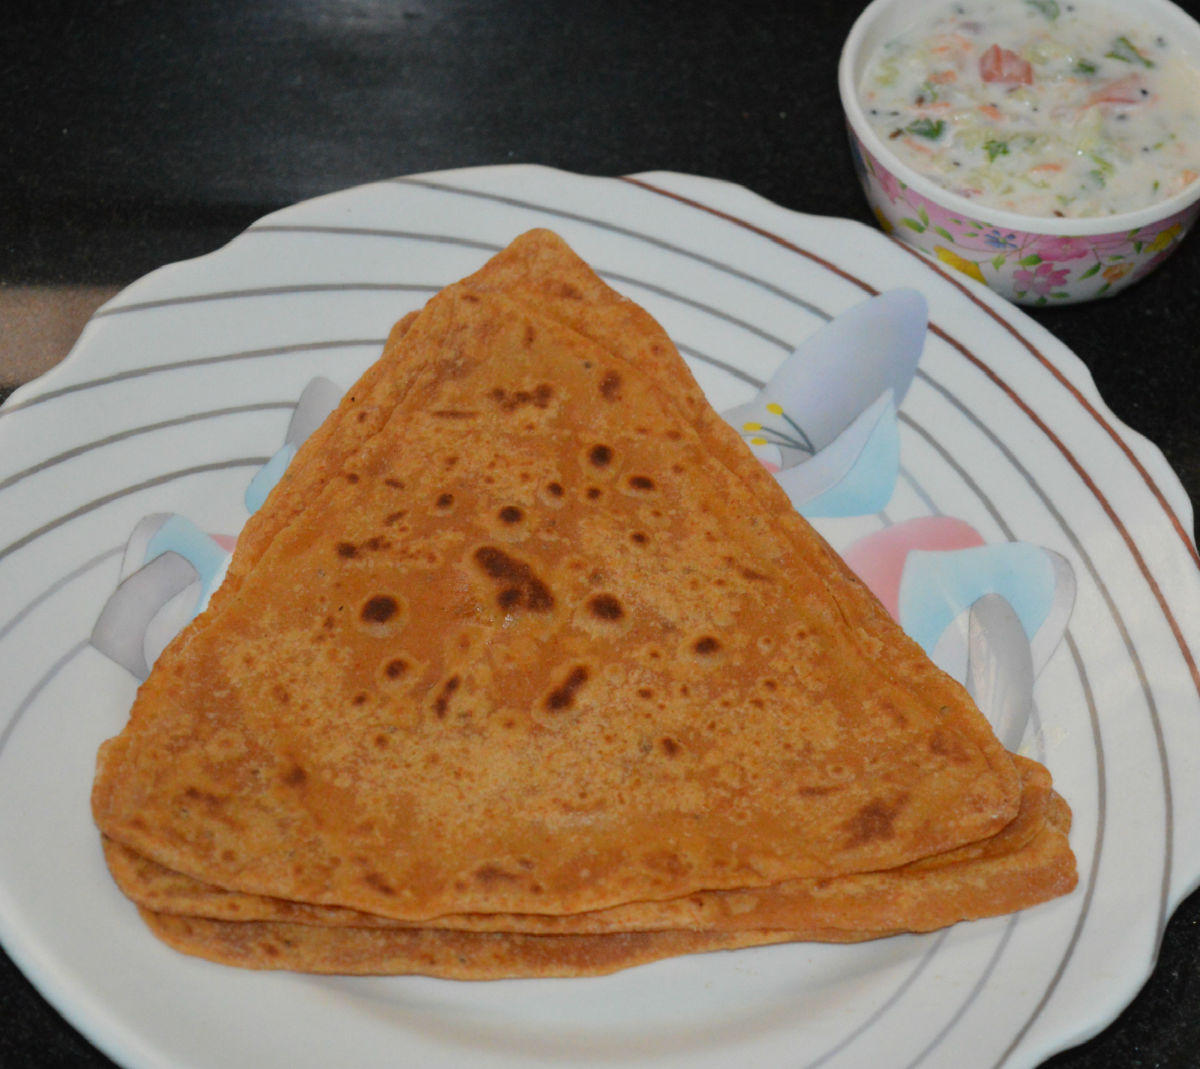 Triangle parathas with vegetable raita